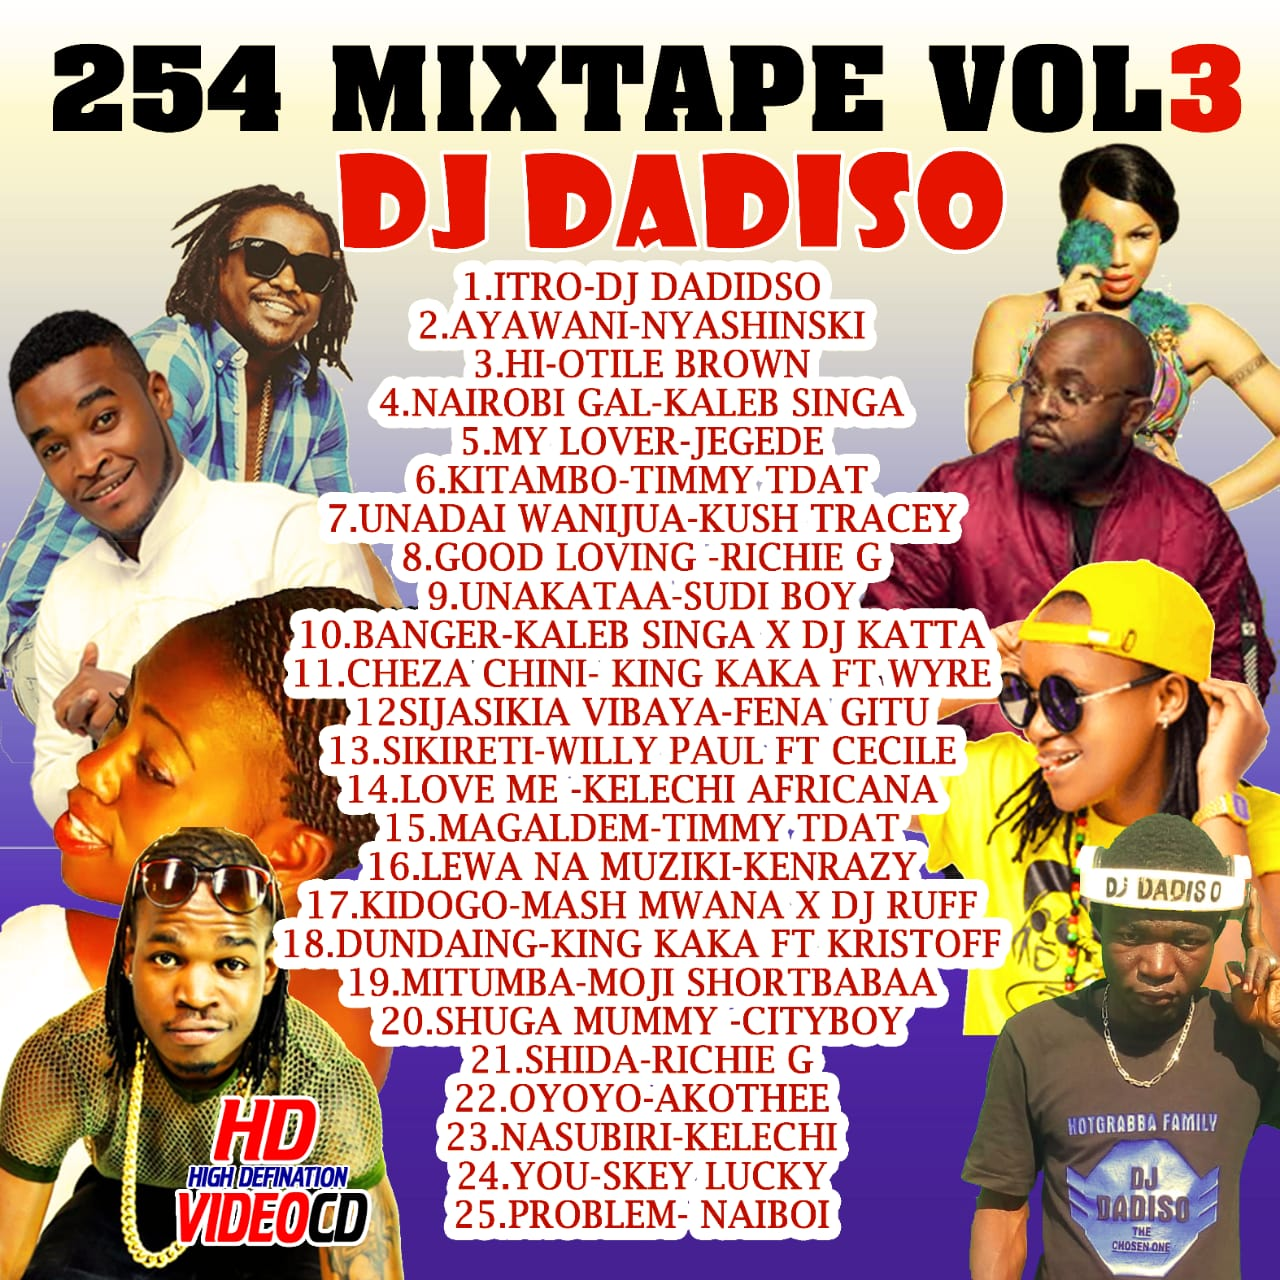 DJ DADISO - BURN OUT BONGO MIXTAPE VOL 1 - DJ DADISO